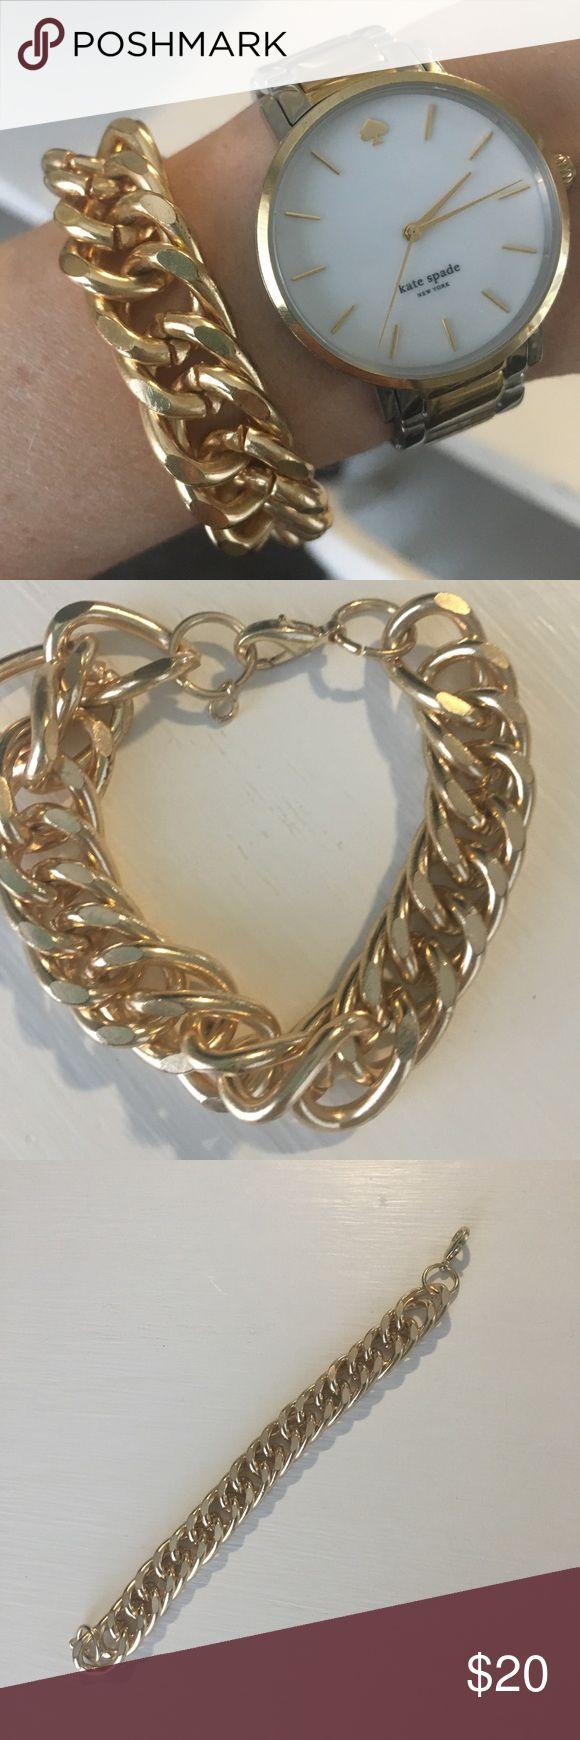 Gold link bracelet Beautiful gold link bracelet. Not real gold. (Watch not for sale) Jewelry Bracelets